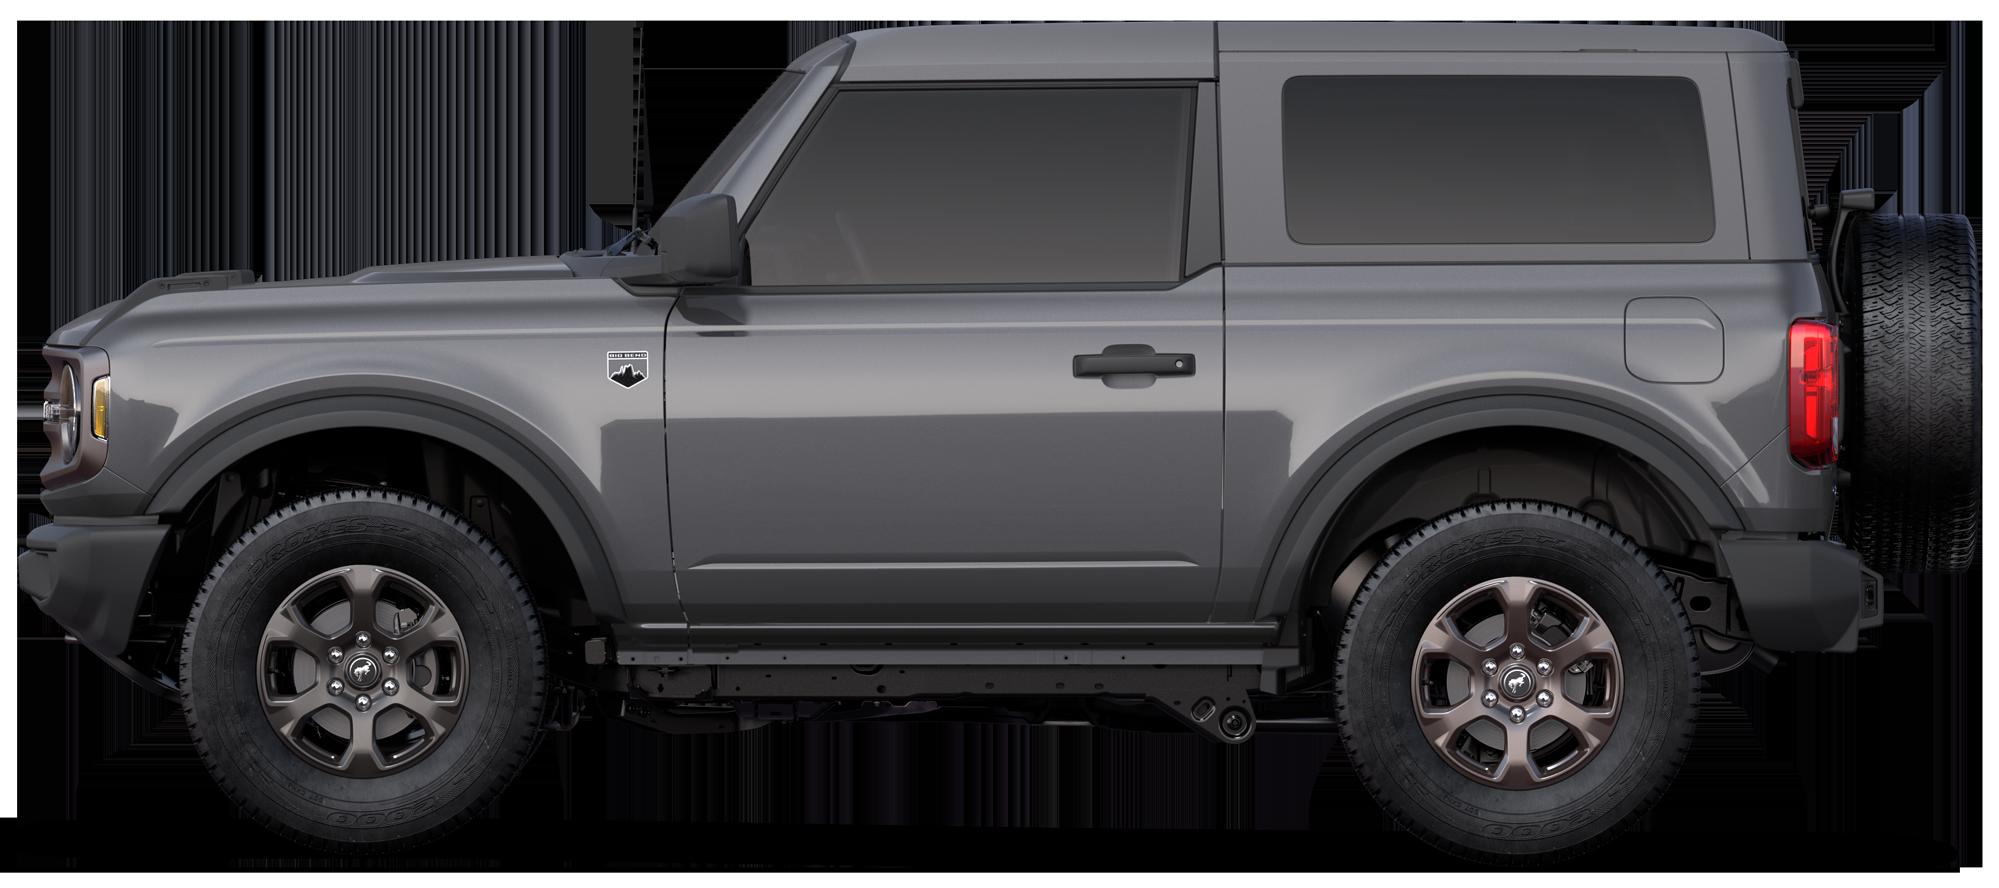 2021 Ford Bronco SUV Big Bend Advanced